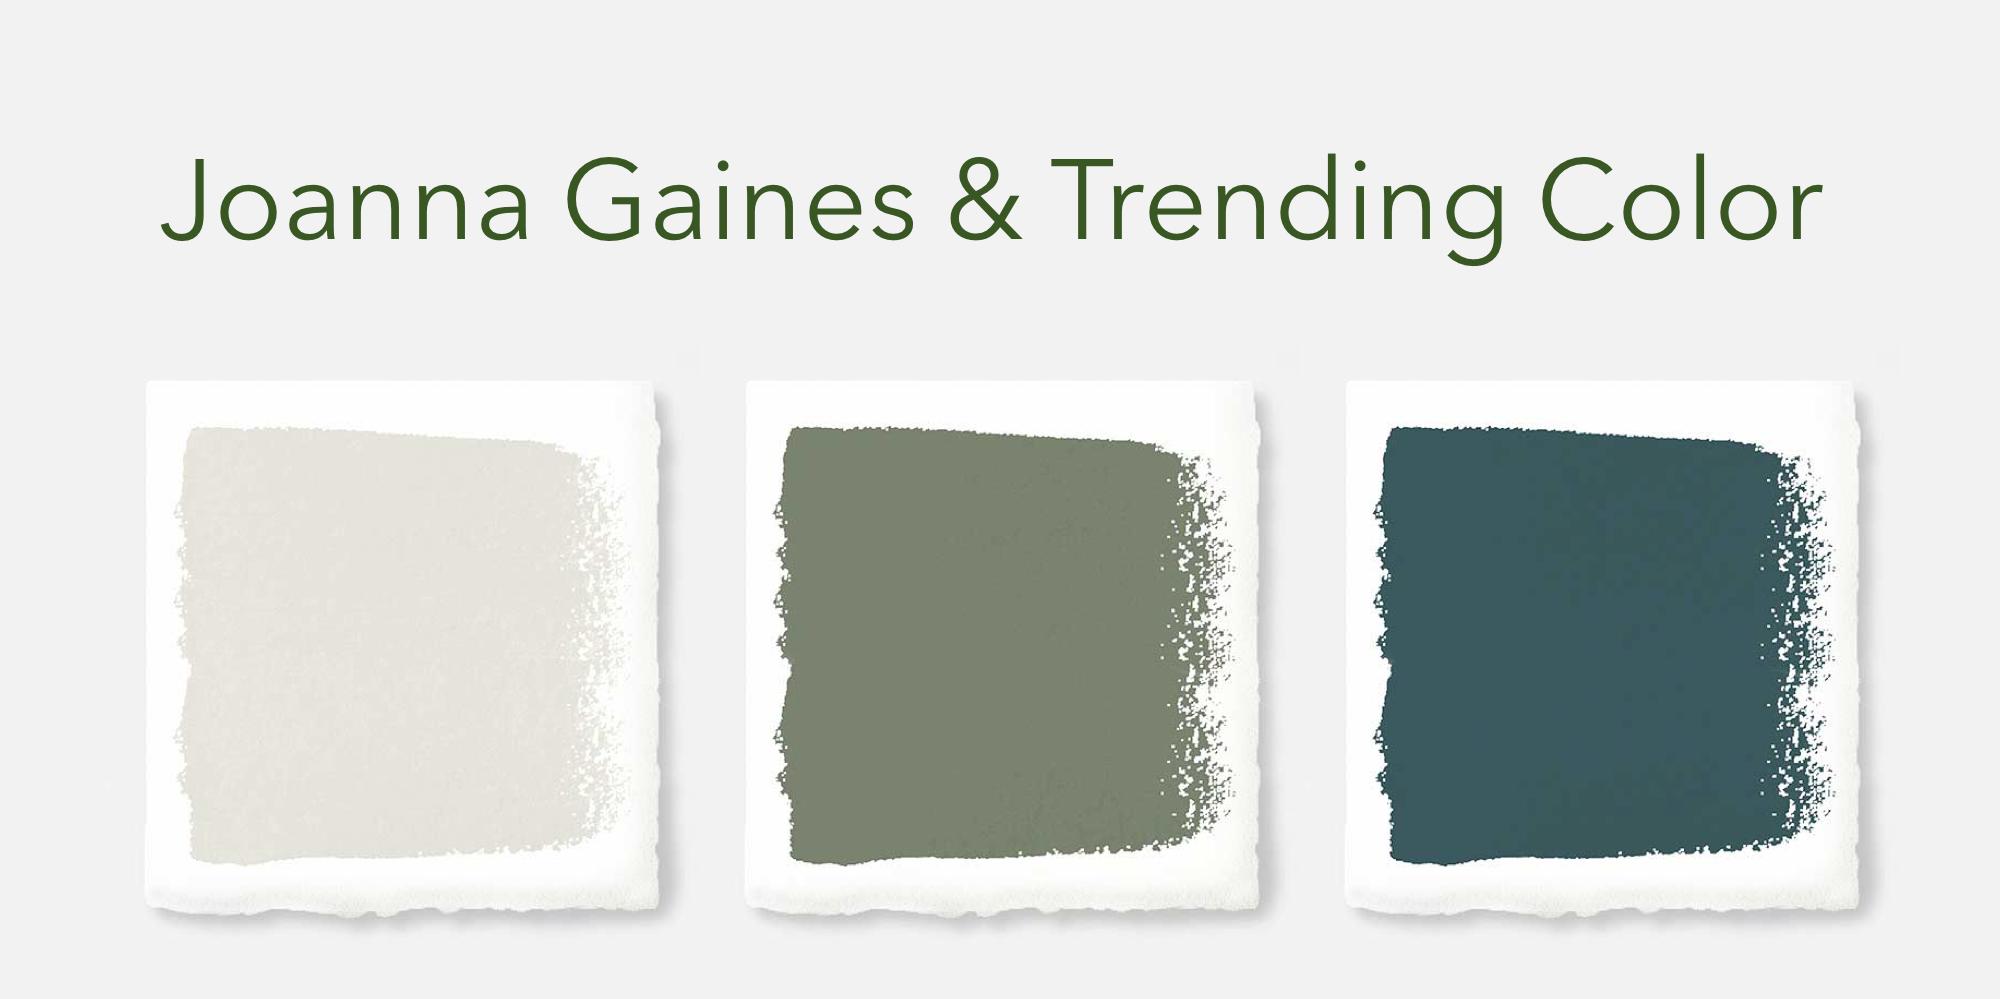 Joanna Gaines & Trending Color